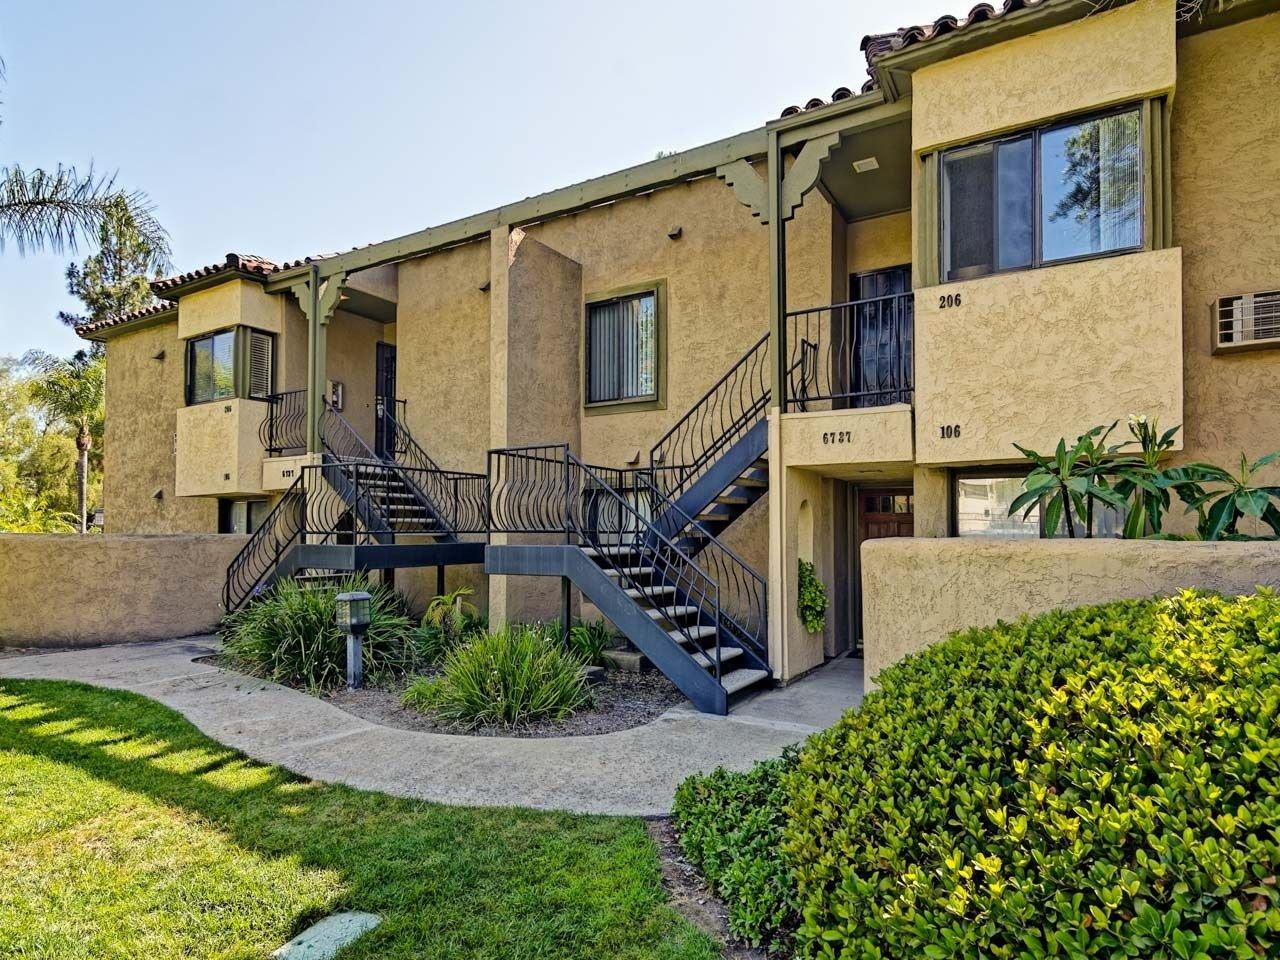 Main Photo: SAN CARLOS Condo for sale : 2 bedrooms : 6737 OAKRIDGE RD #206 in SAN DIEGO